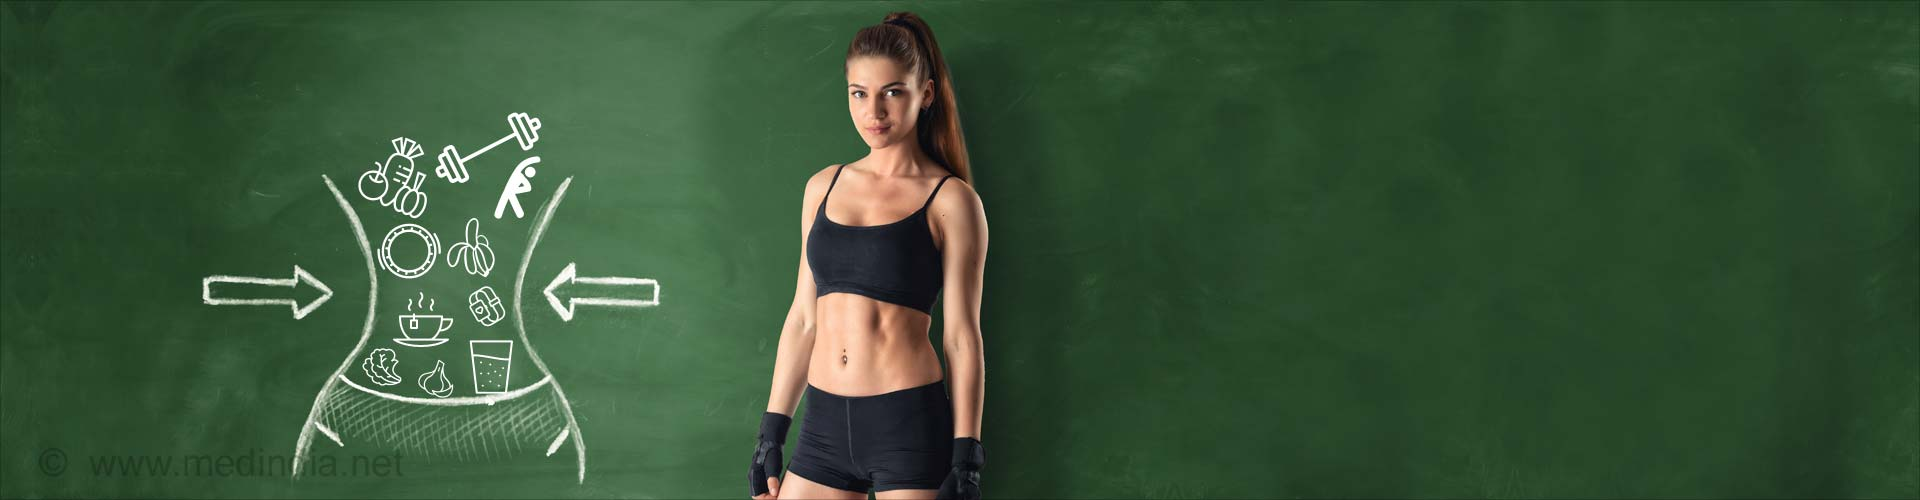 fast metabolism diet week 2 no weight loss